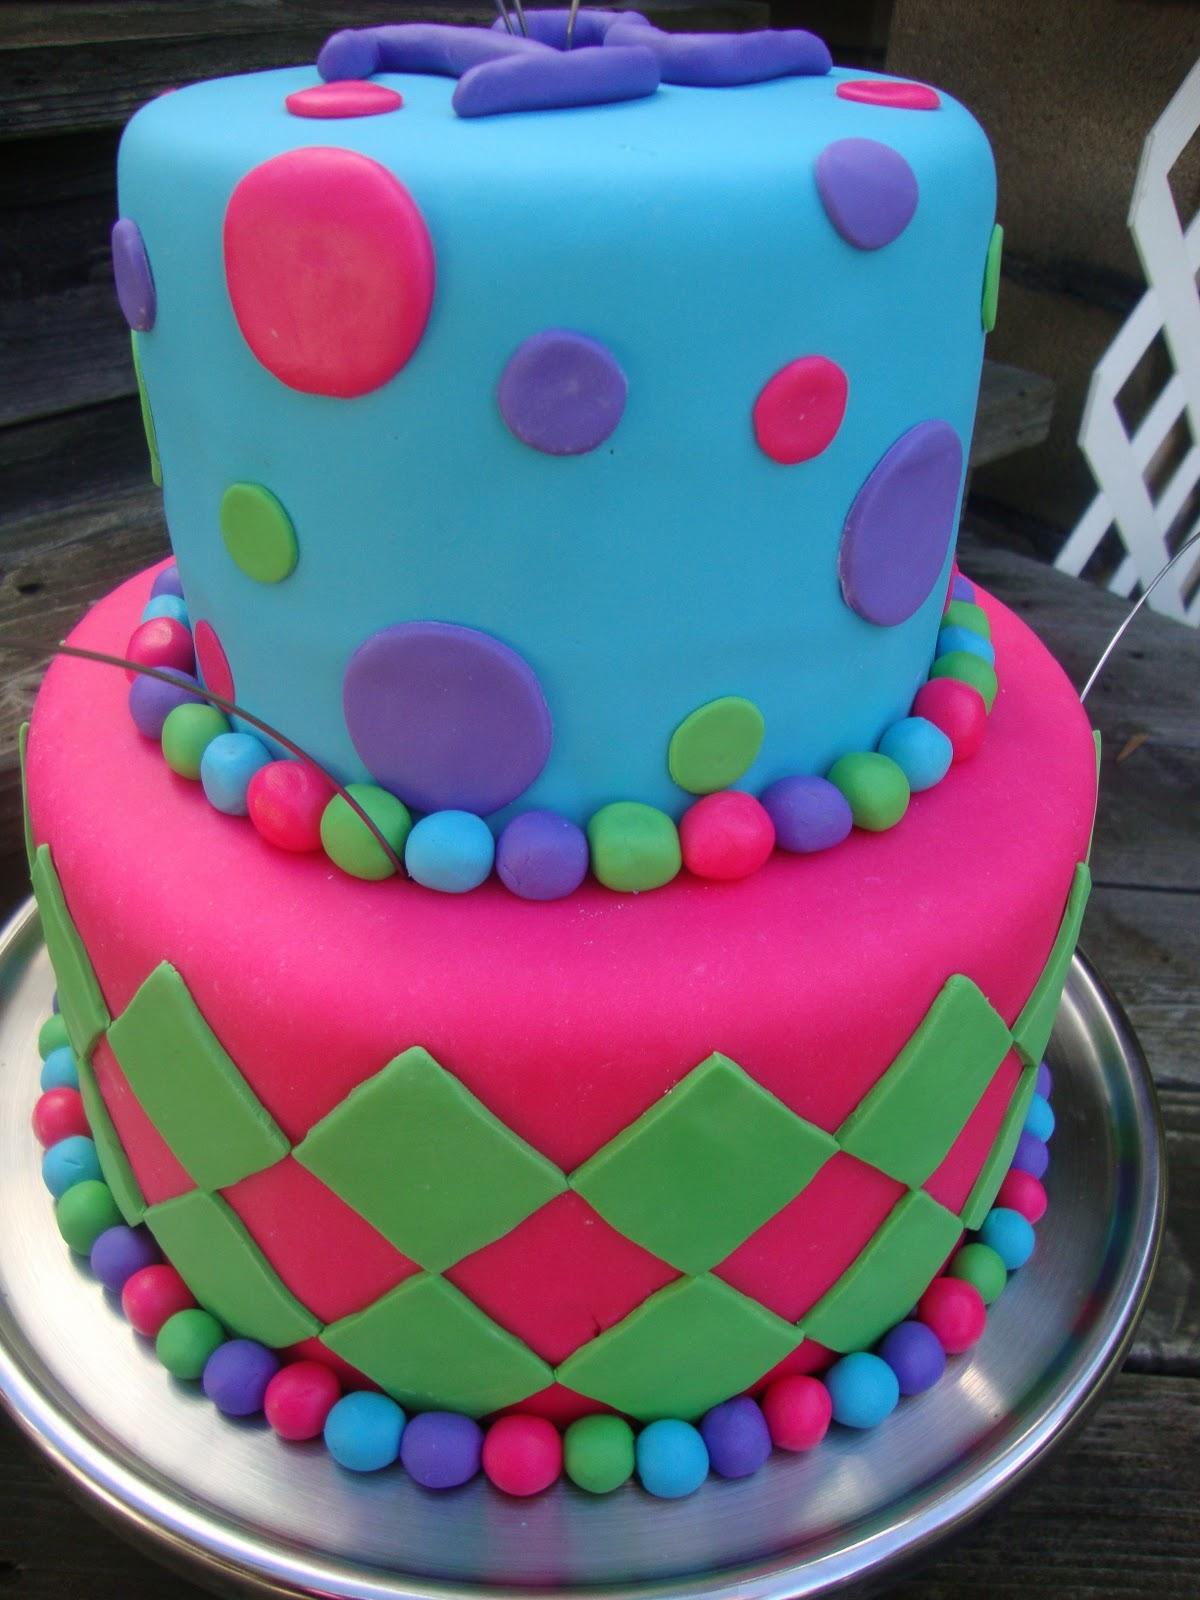 Birthday Cake Cool Ideas Image Inspiration of Cake and Birthday